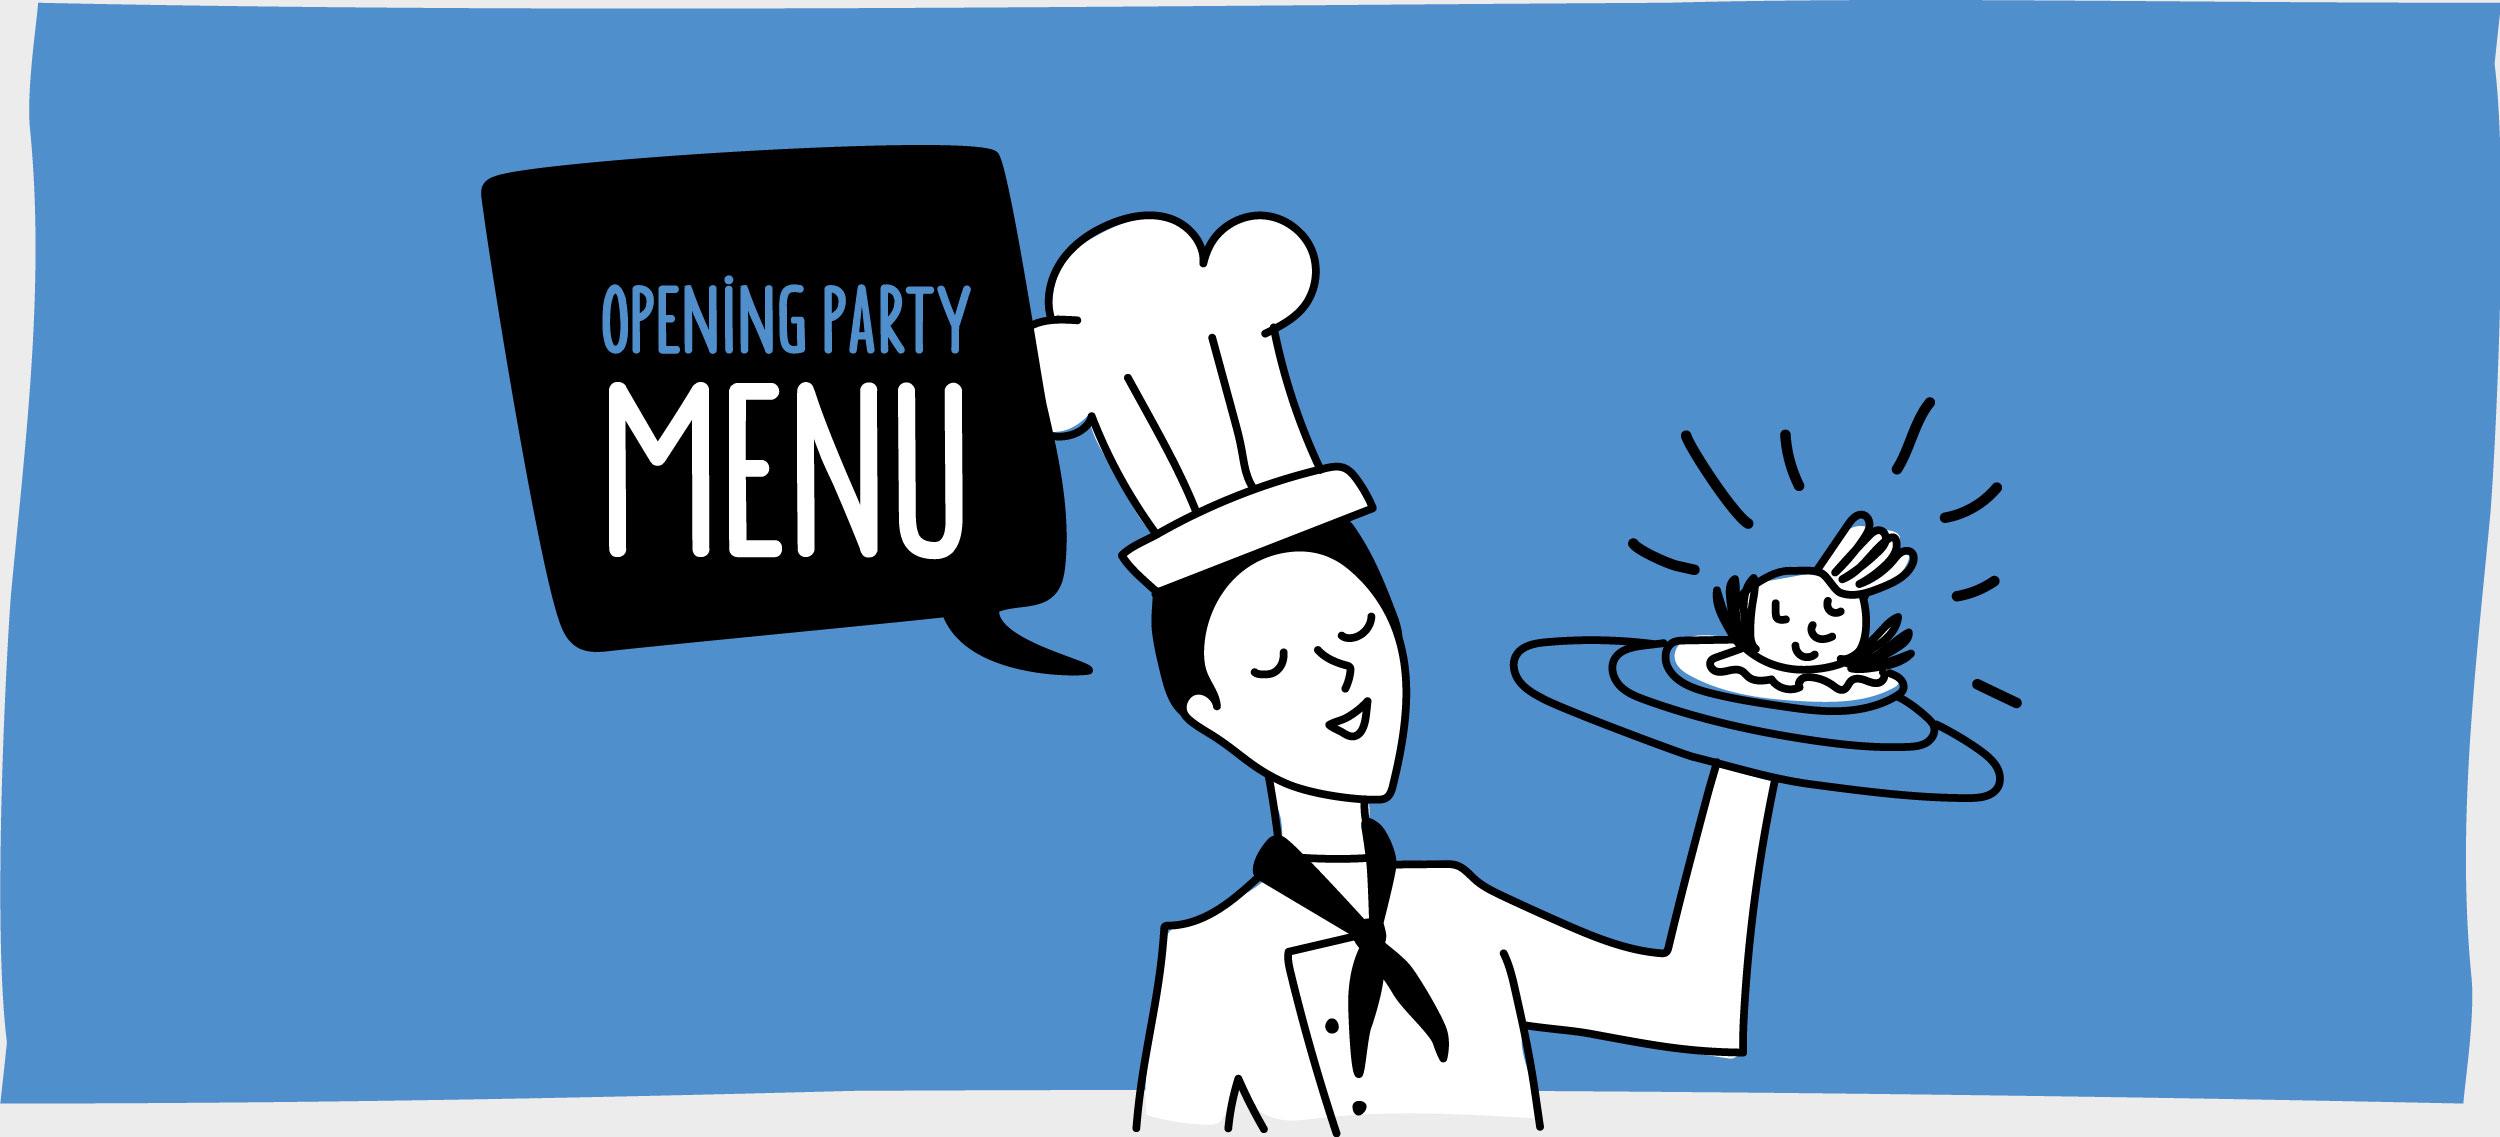 TRANSfair opening party menu by GPU Design